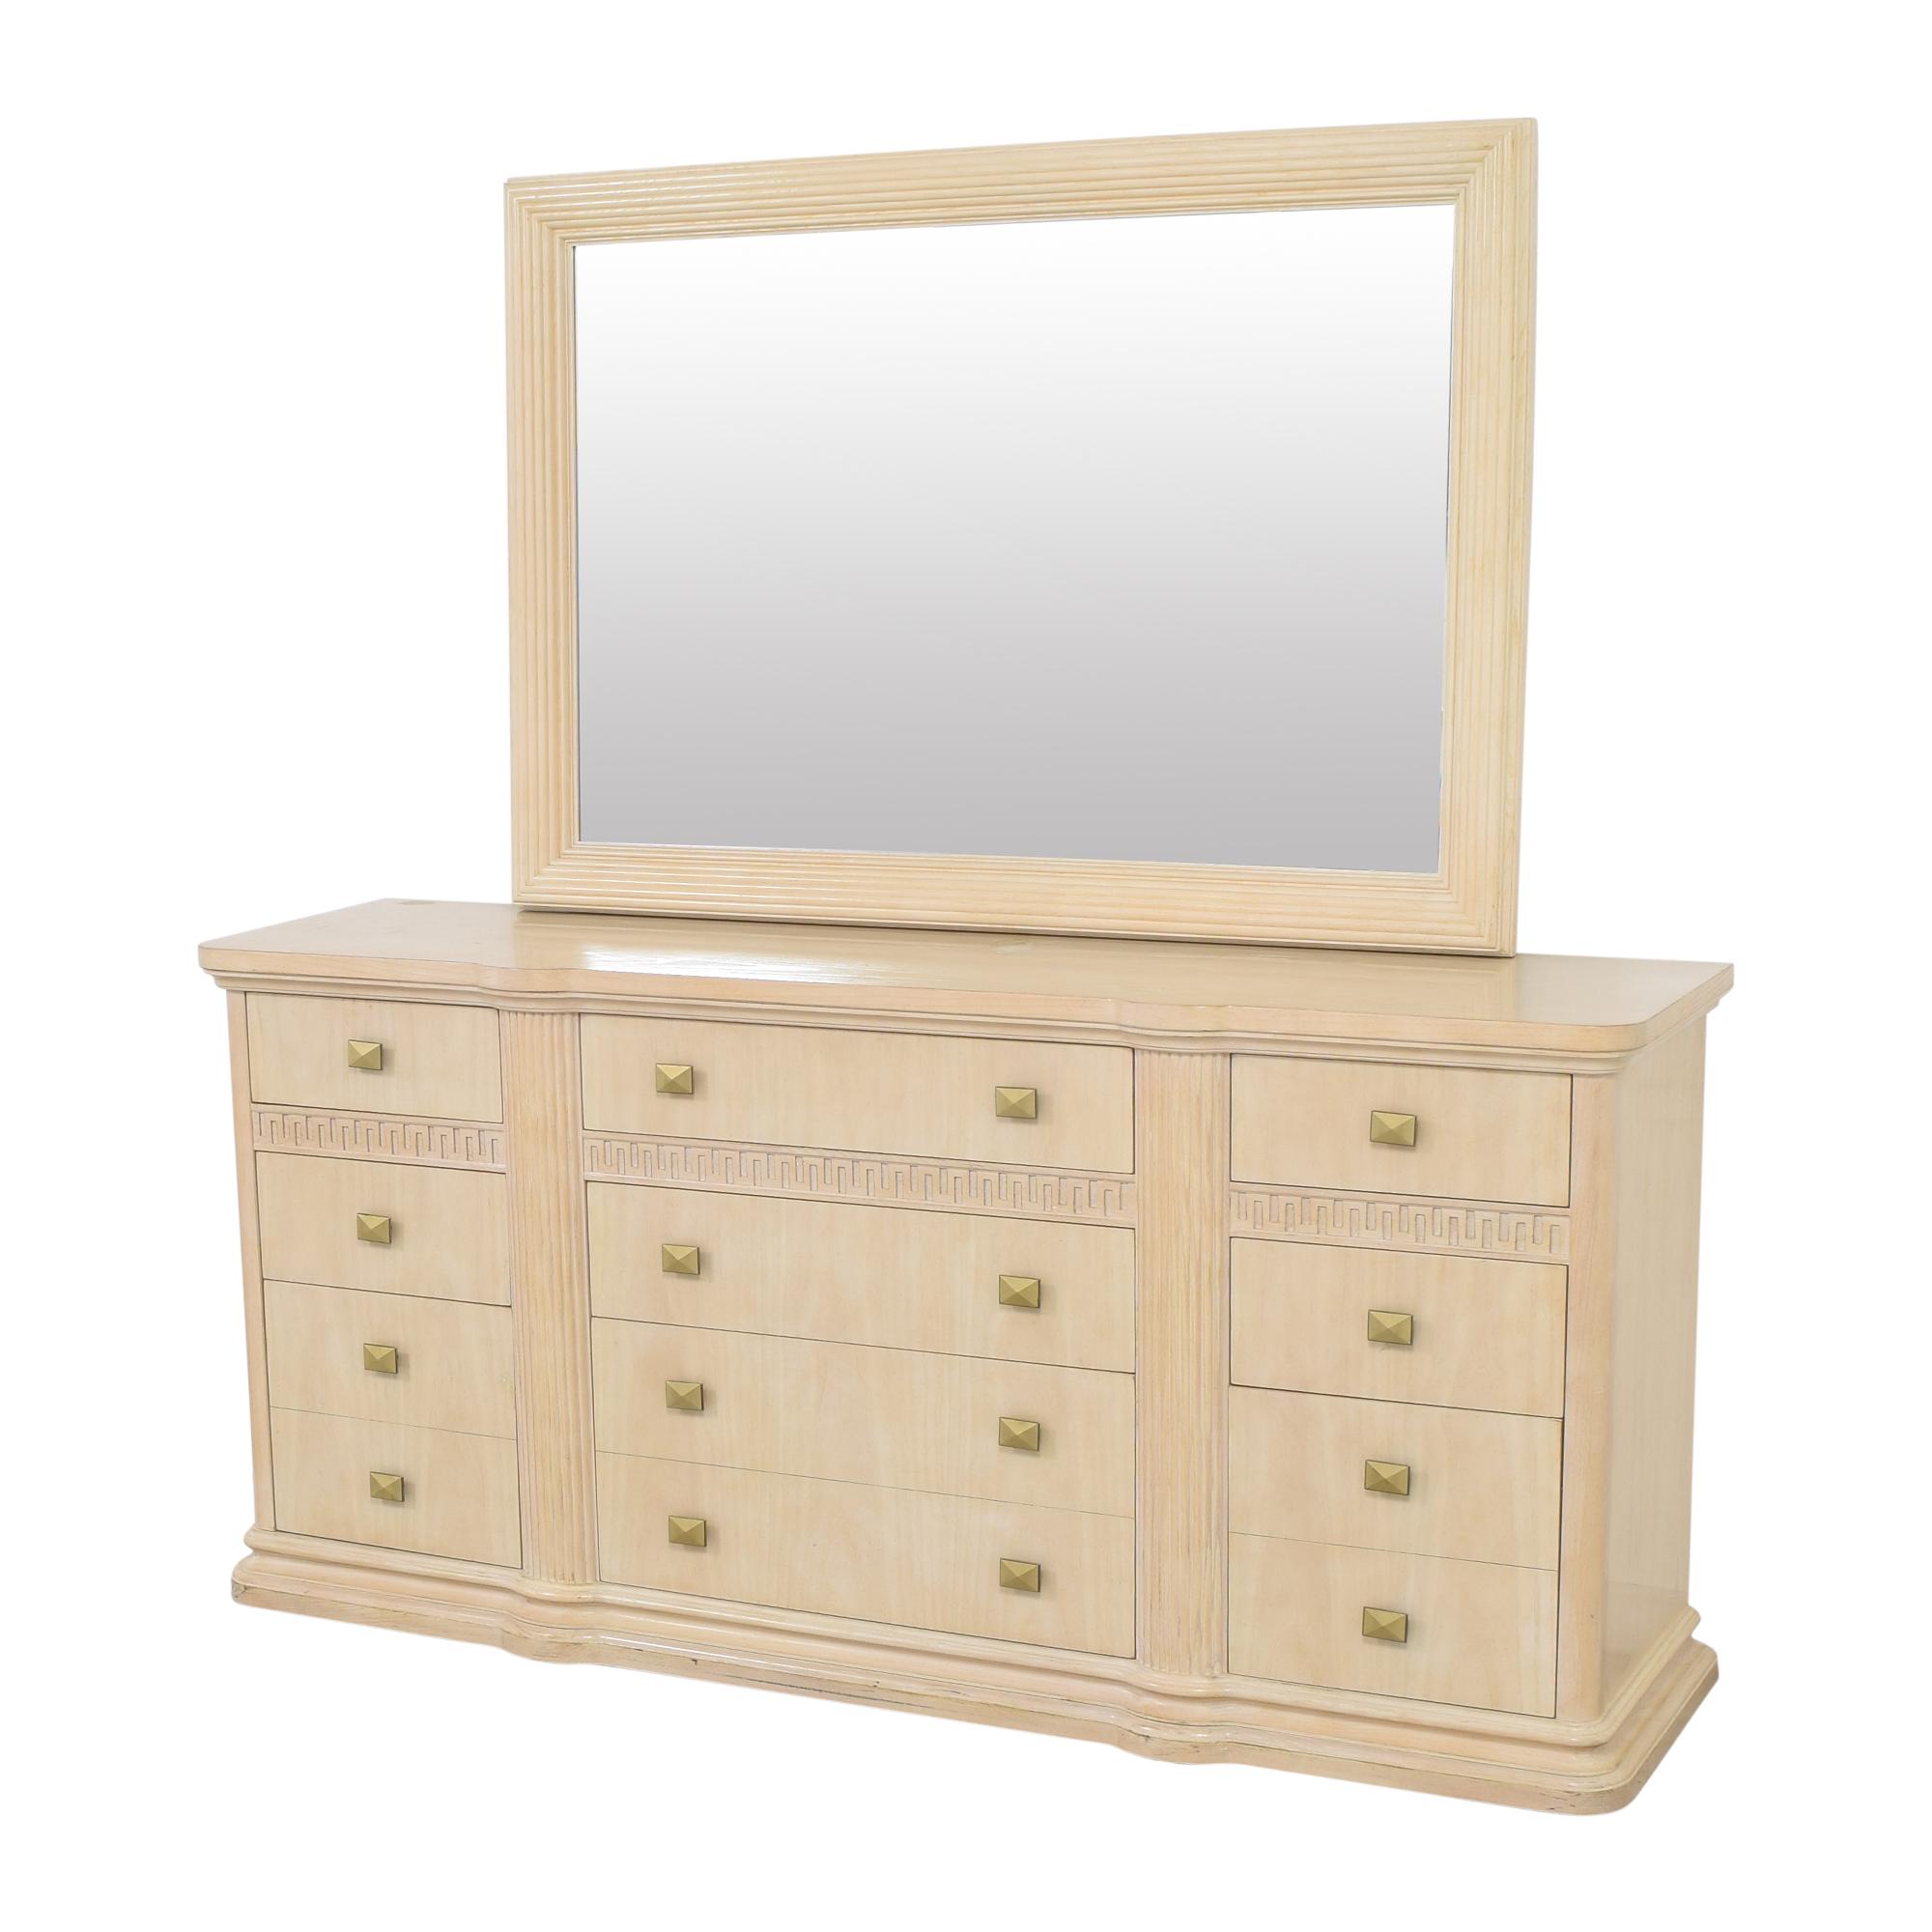 Drexel Heritage Drexel Heritage Wide Dresser with Mirror used